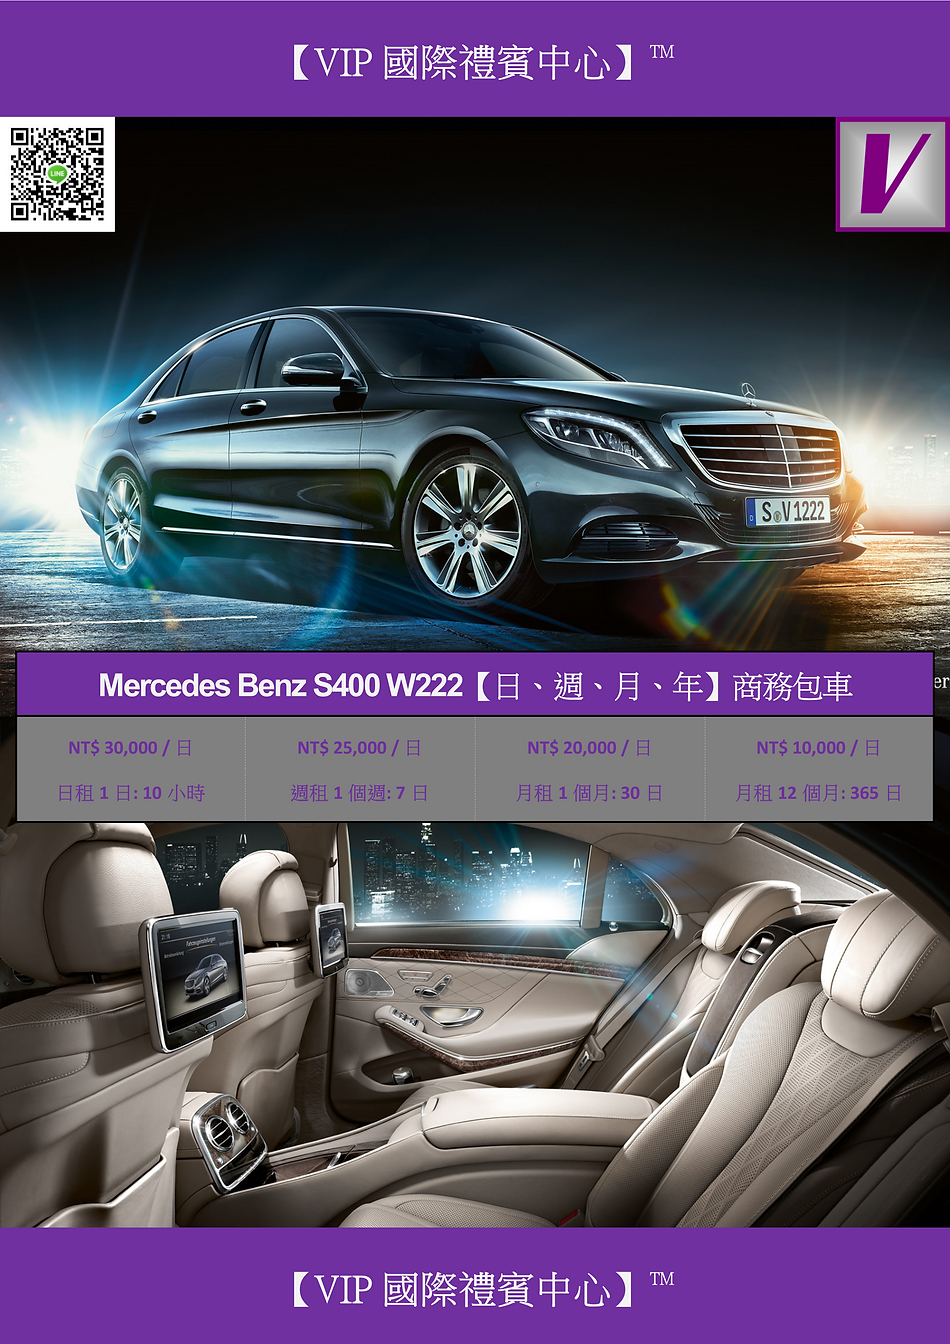 VIP國際禮賓中心 MERCEDES BENZ S400 W222 臺北市區接送包車